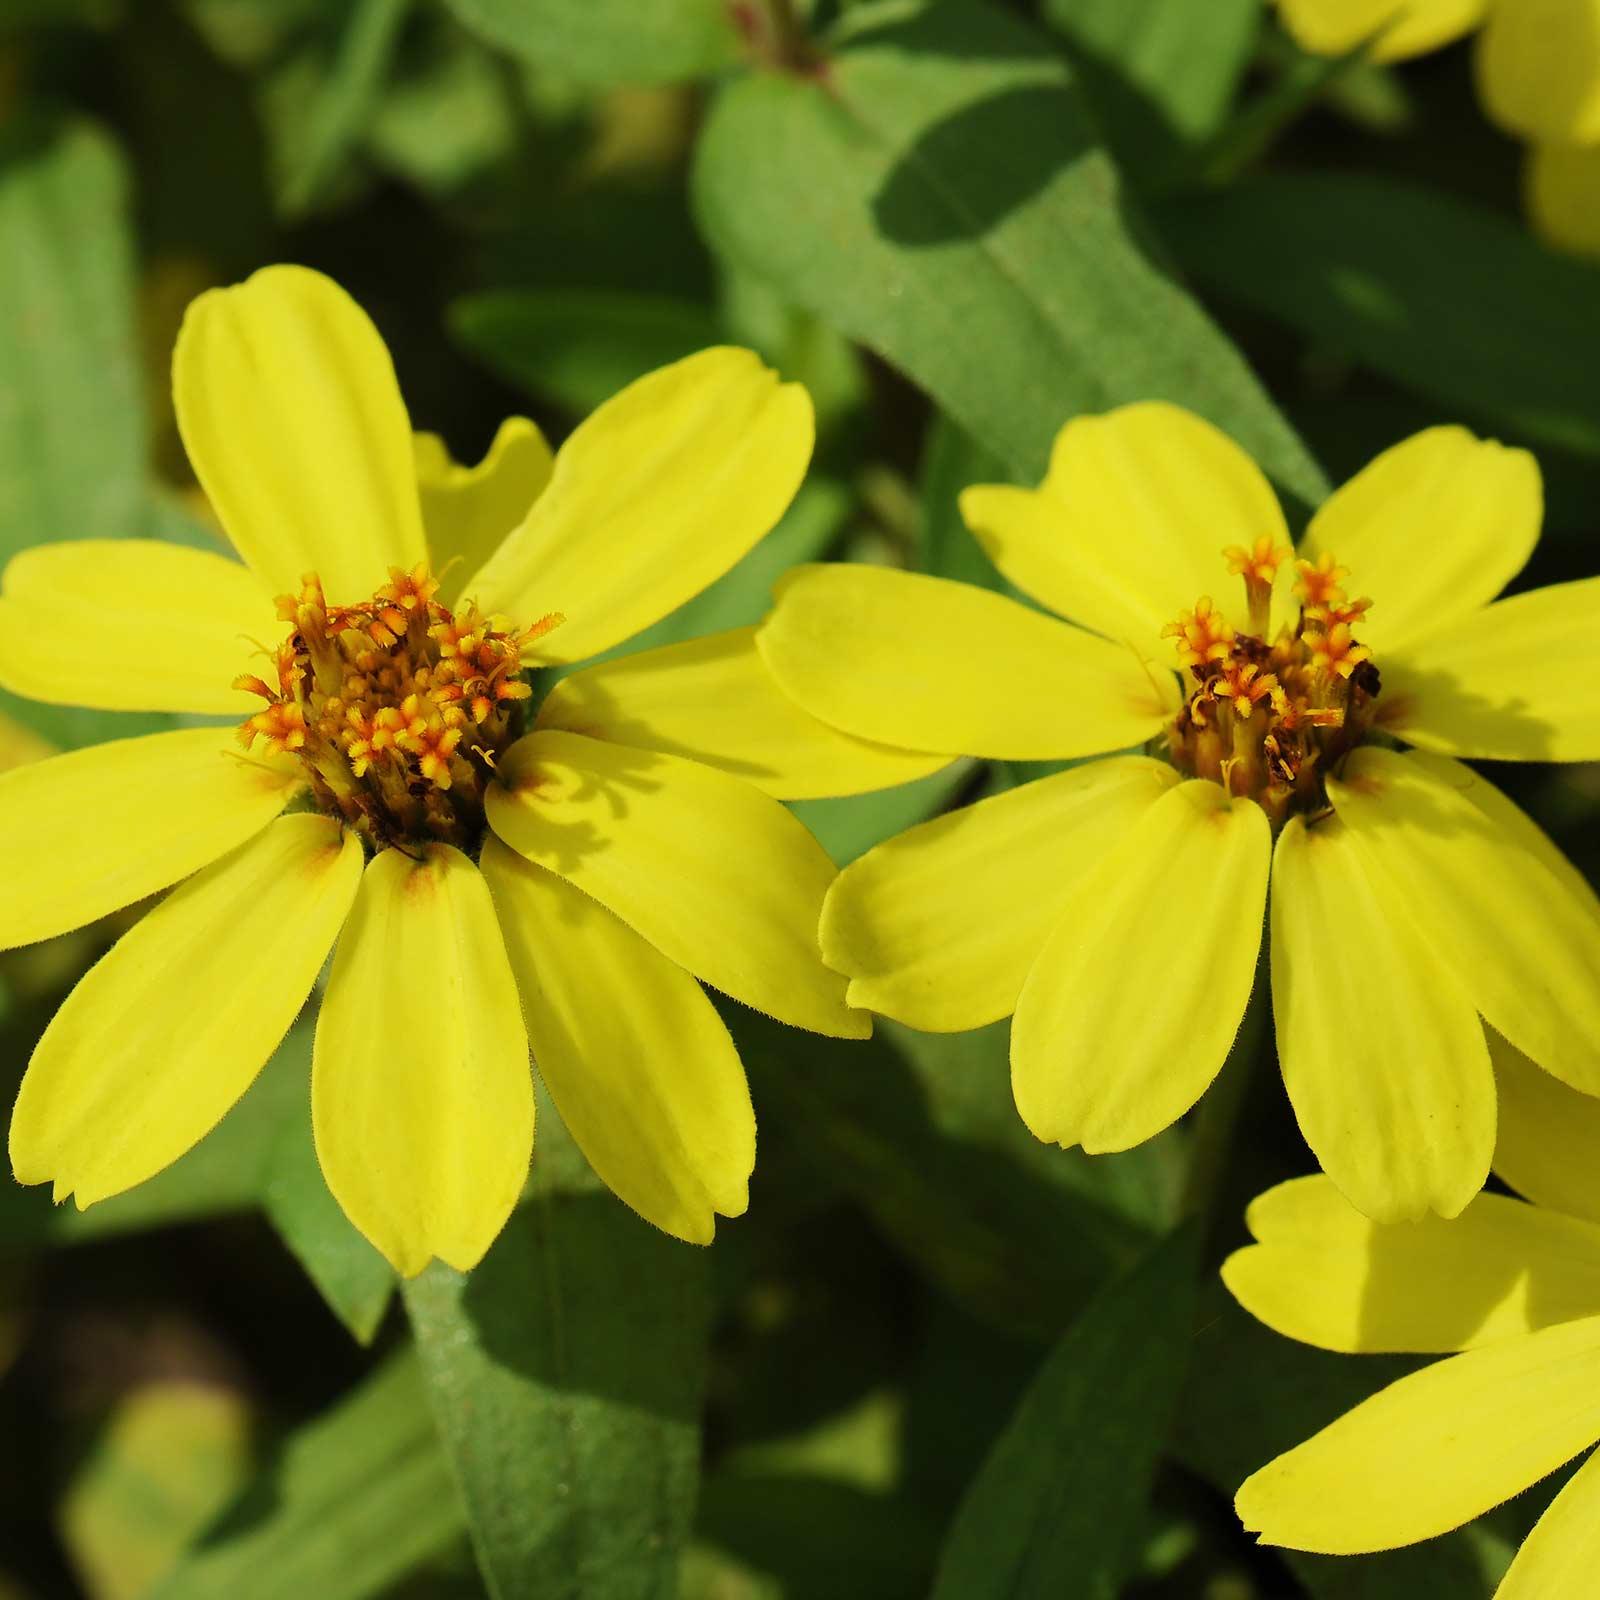 Zinnia Flower Garden Seeds Profusion Series Yellow 100 Seed